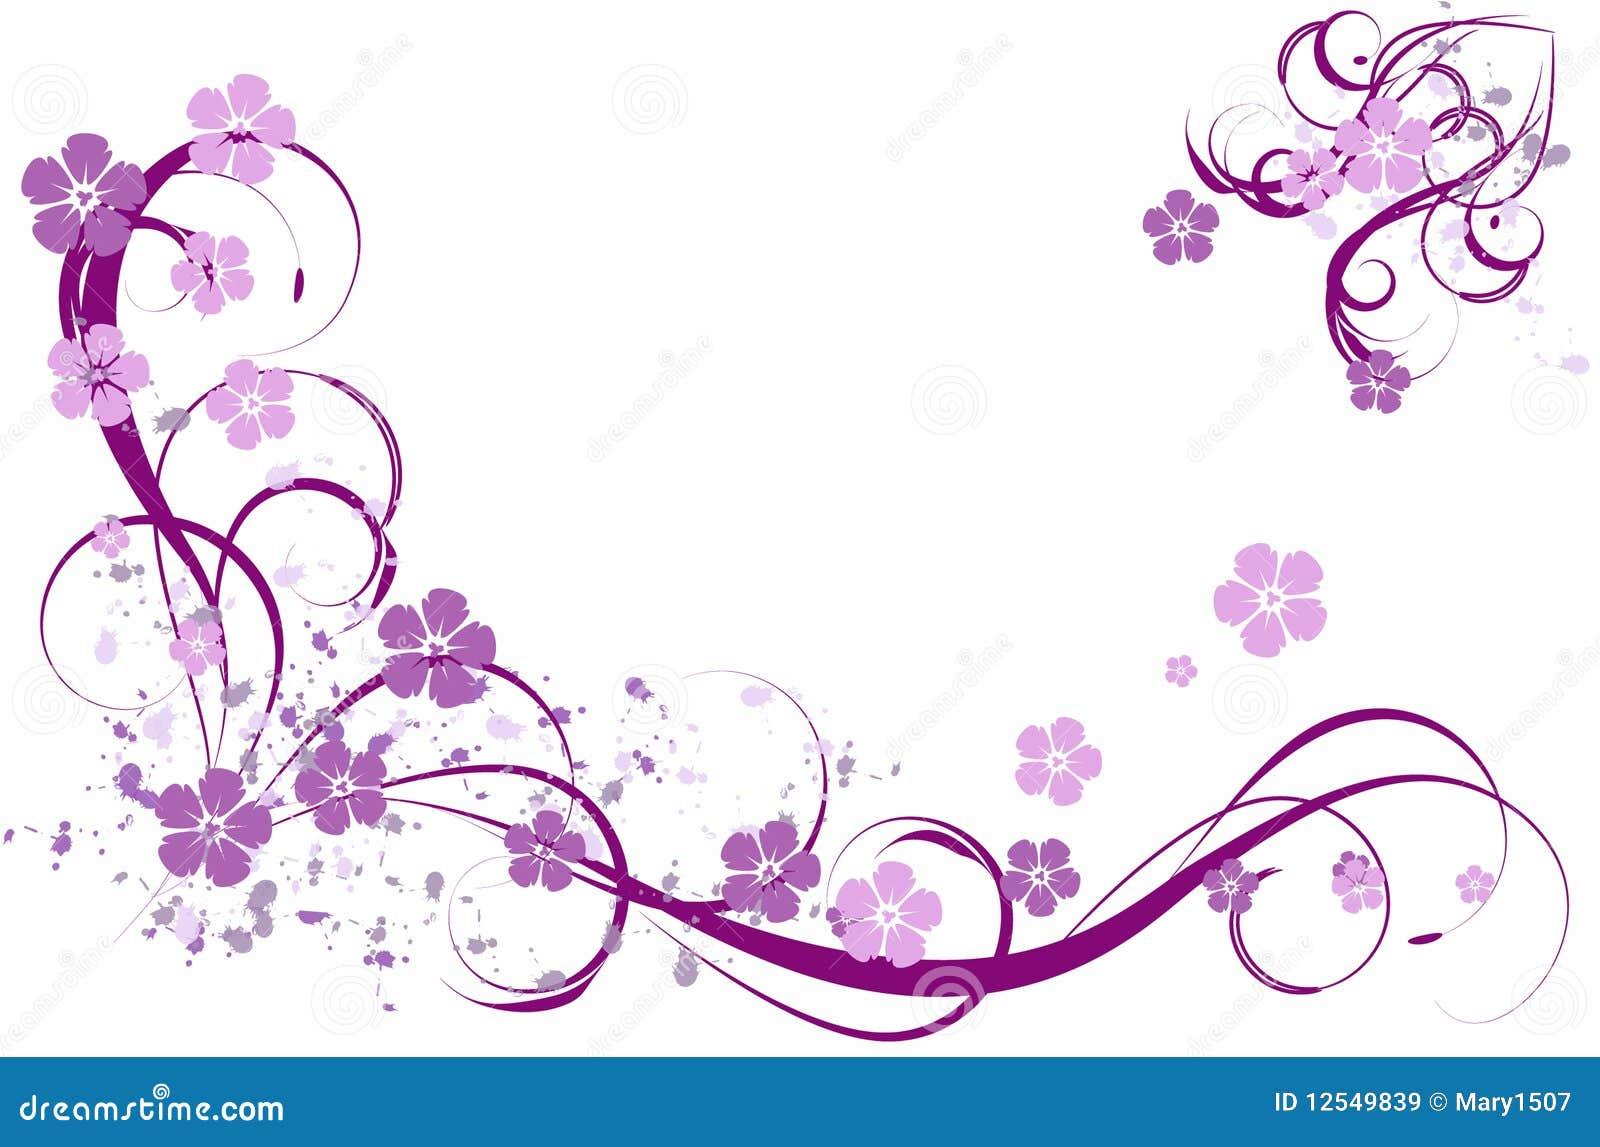 Lila muster vektor abbildung illustration von kurven for Mural de flores y mariposas